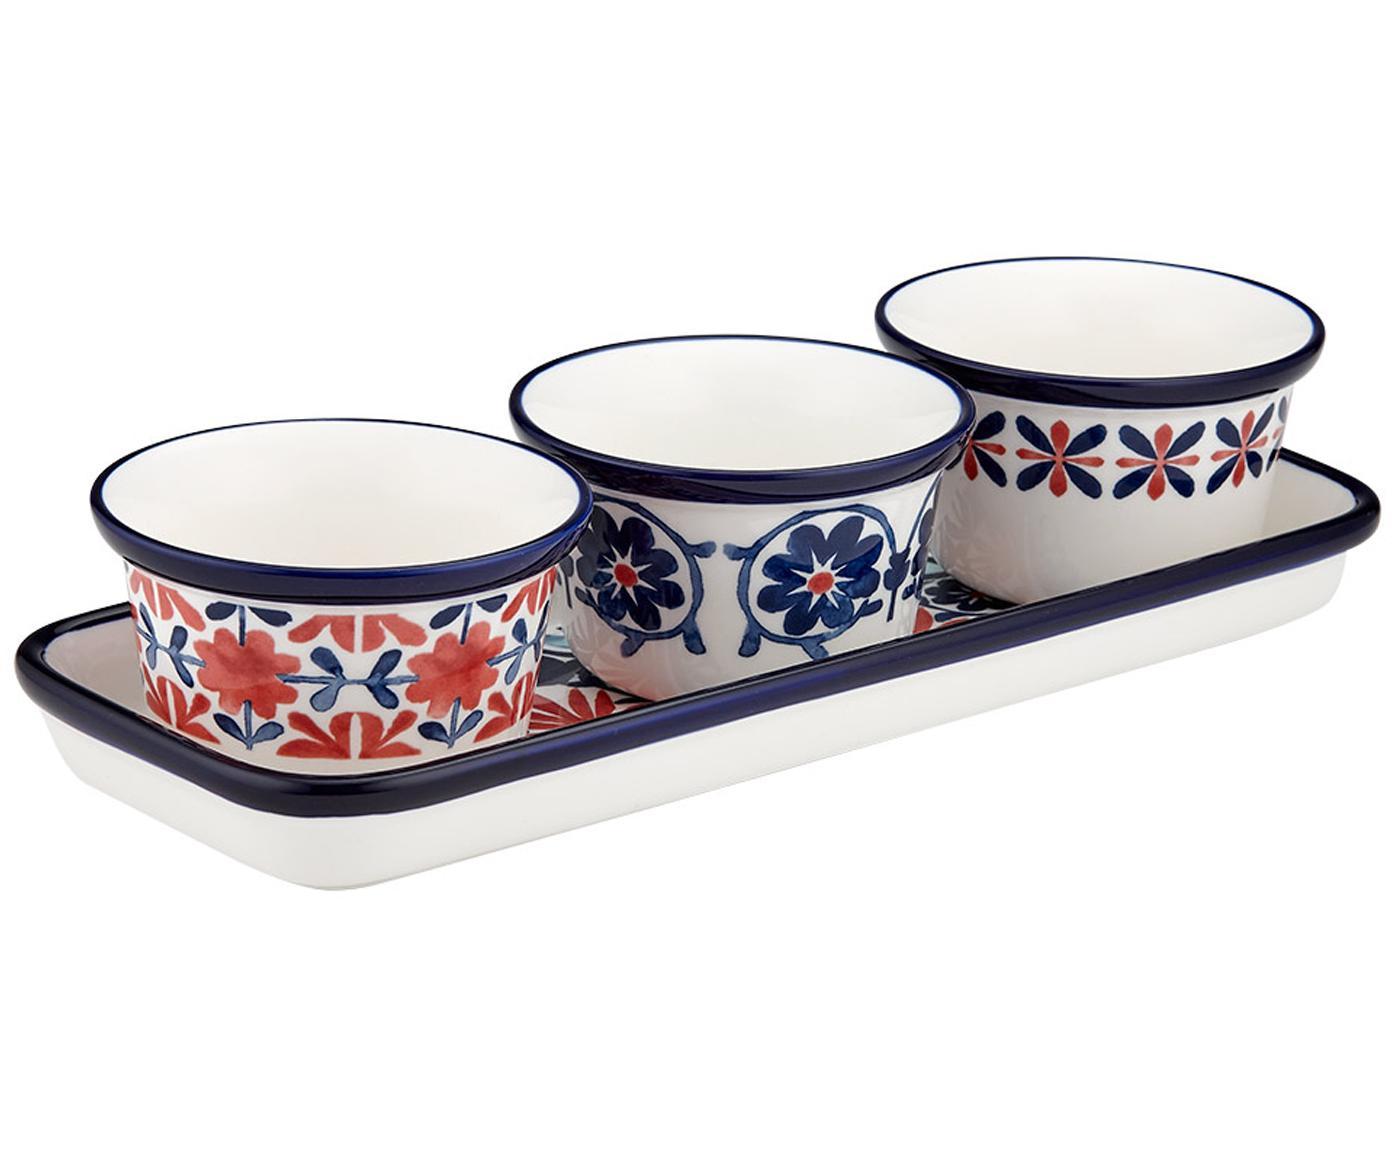 Serveerset Fiesta, 4-delig, New Bone China, Rood, blauwtinten, wit, Ø 10 x H 6 cm